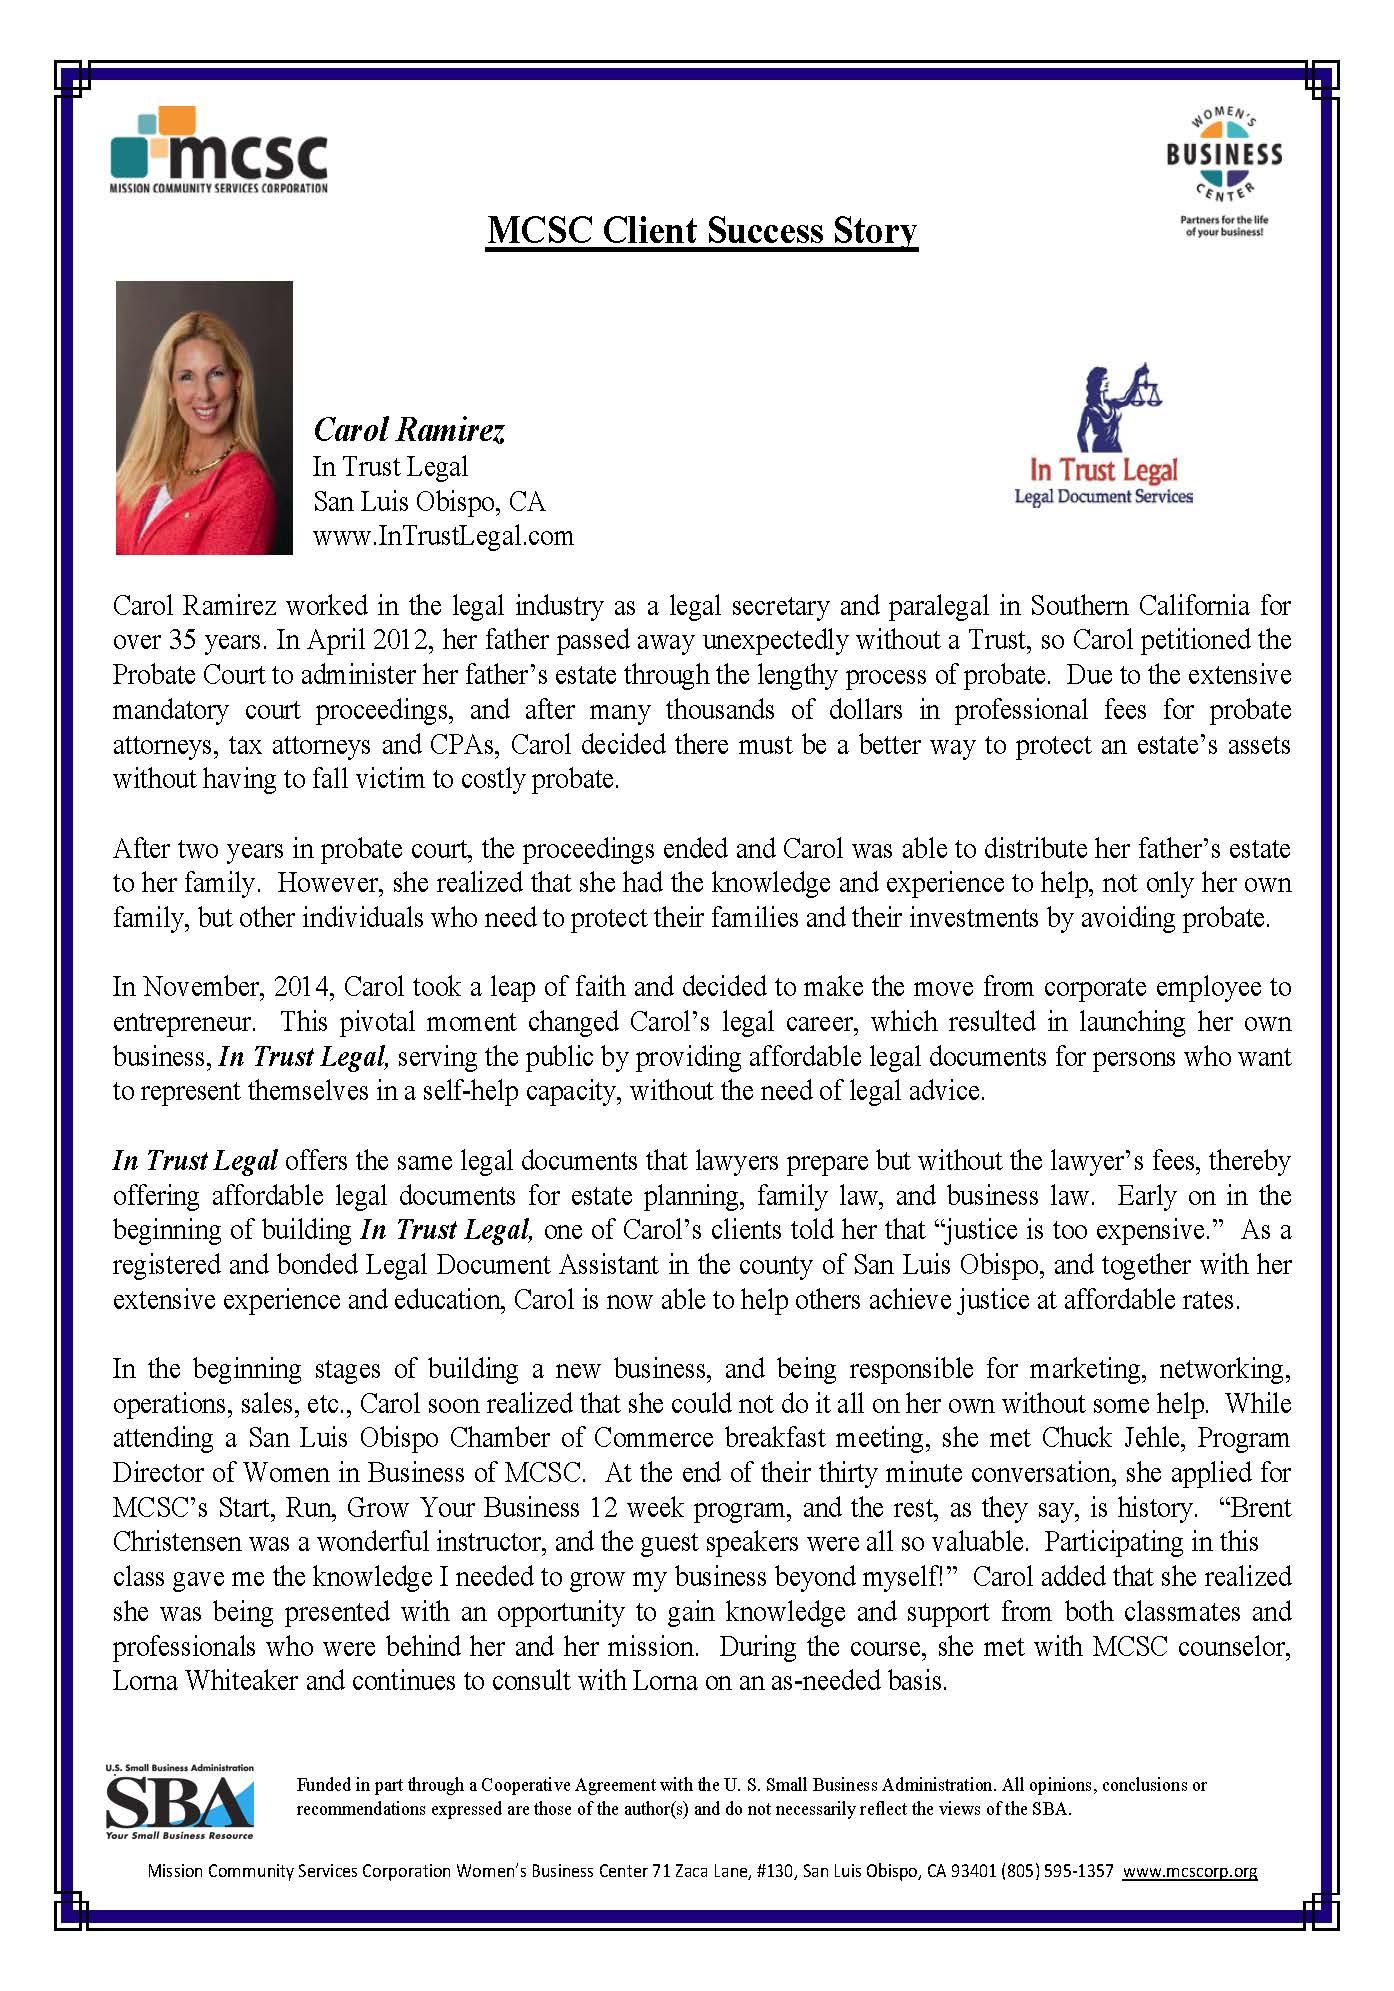 In Trust Legal Expands Carol Ramirez Success Story Mission - Corporation legal documents